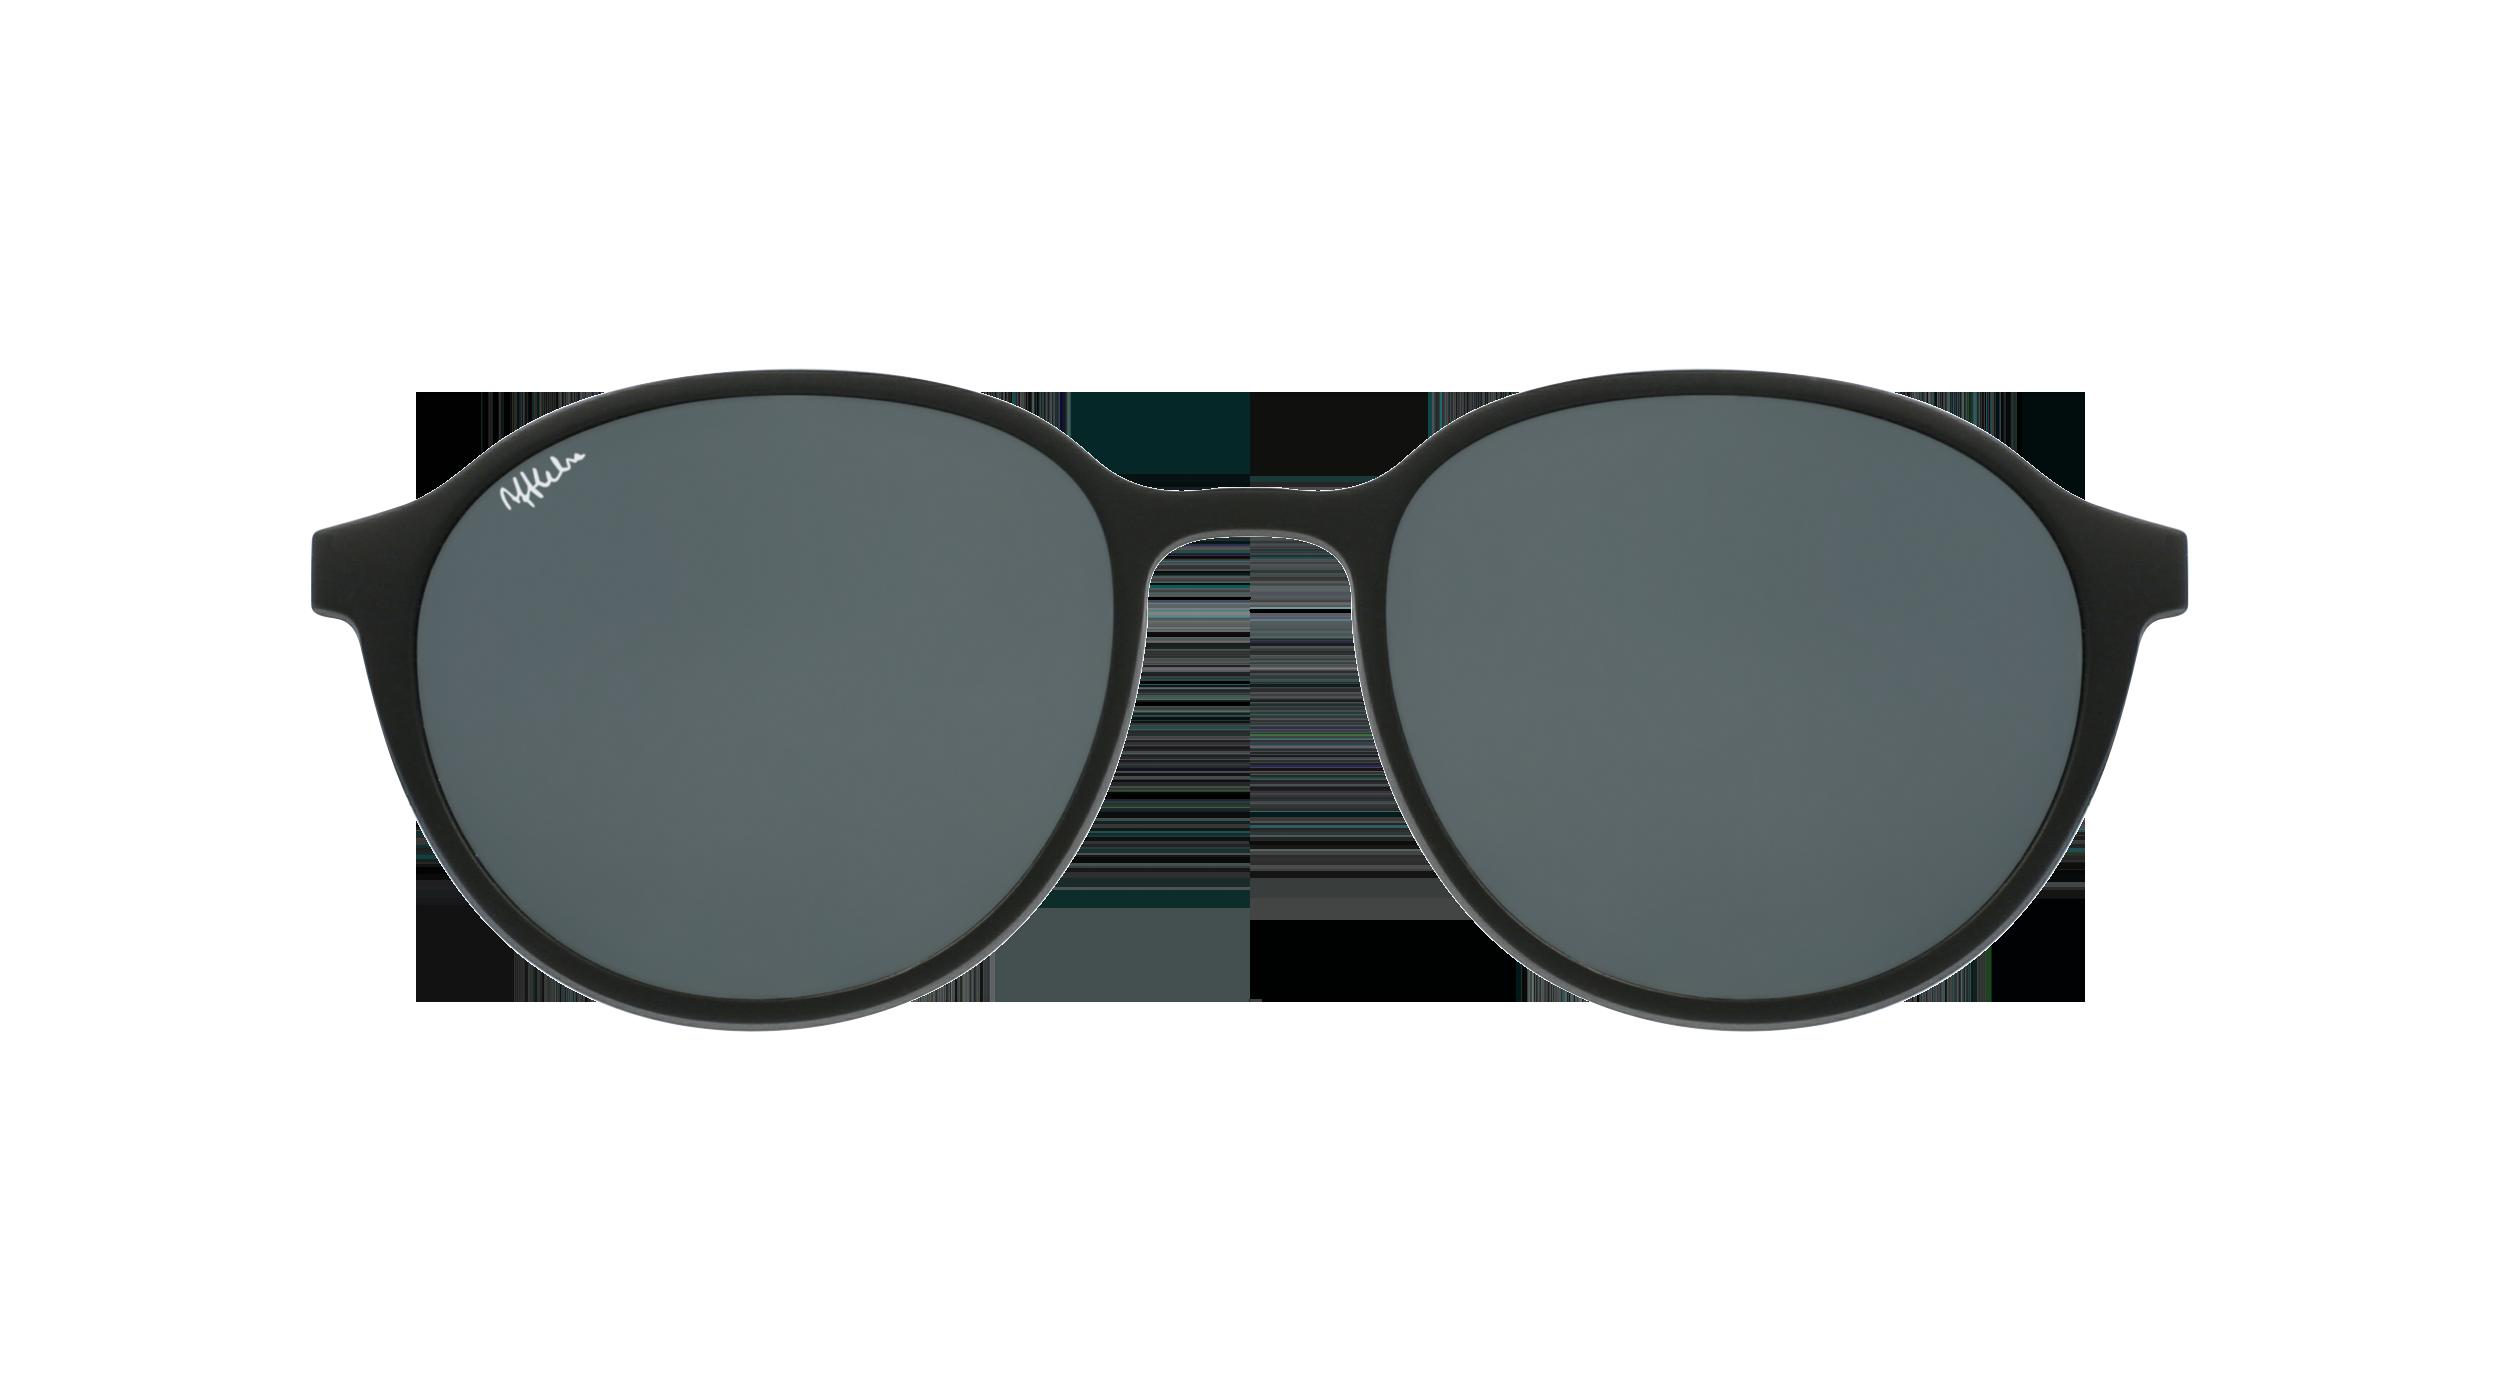 afflelou/france/products/smart_clip/clips_glasses/07630036458747.png